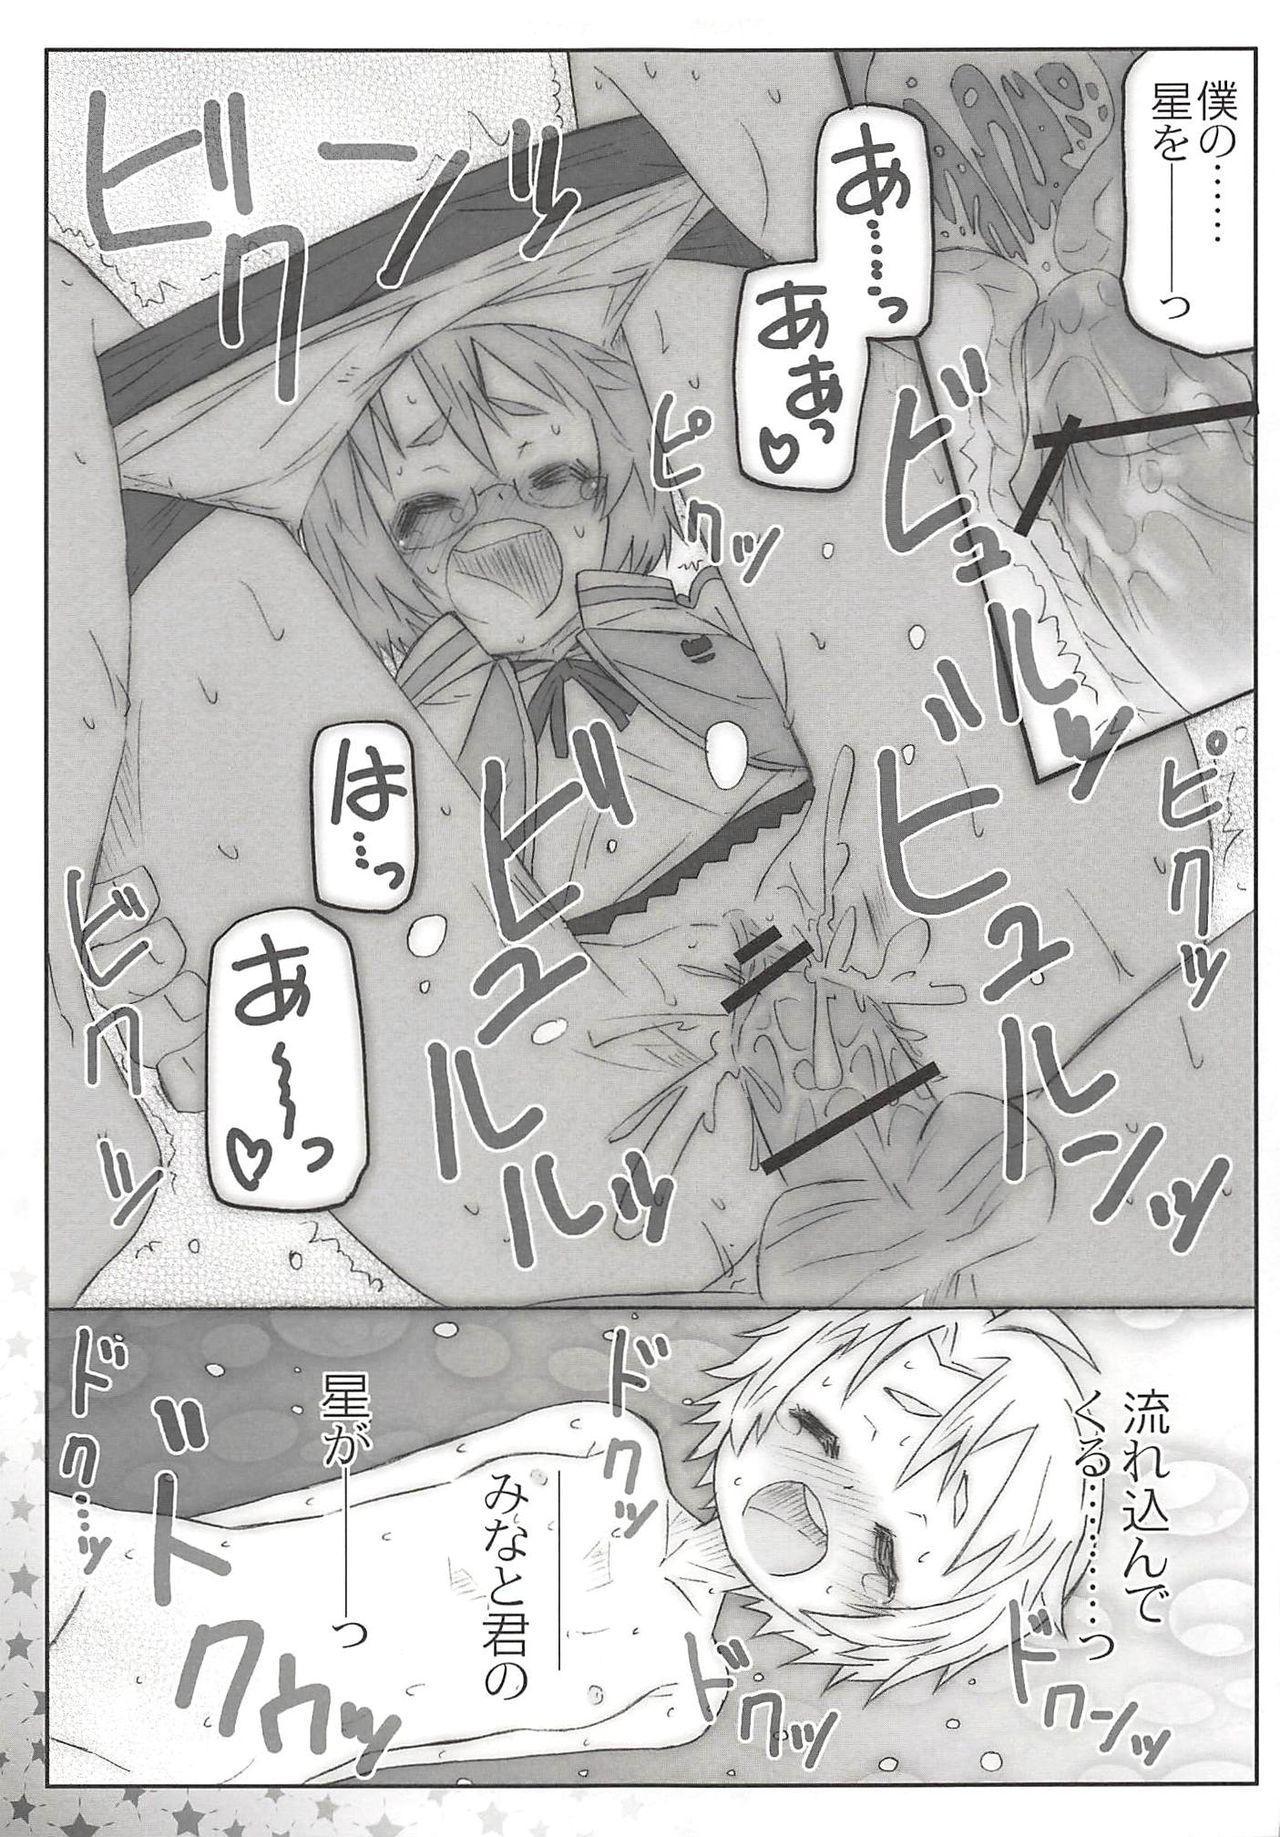 THE Mahou Shoujo 98